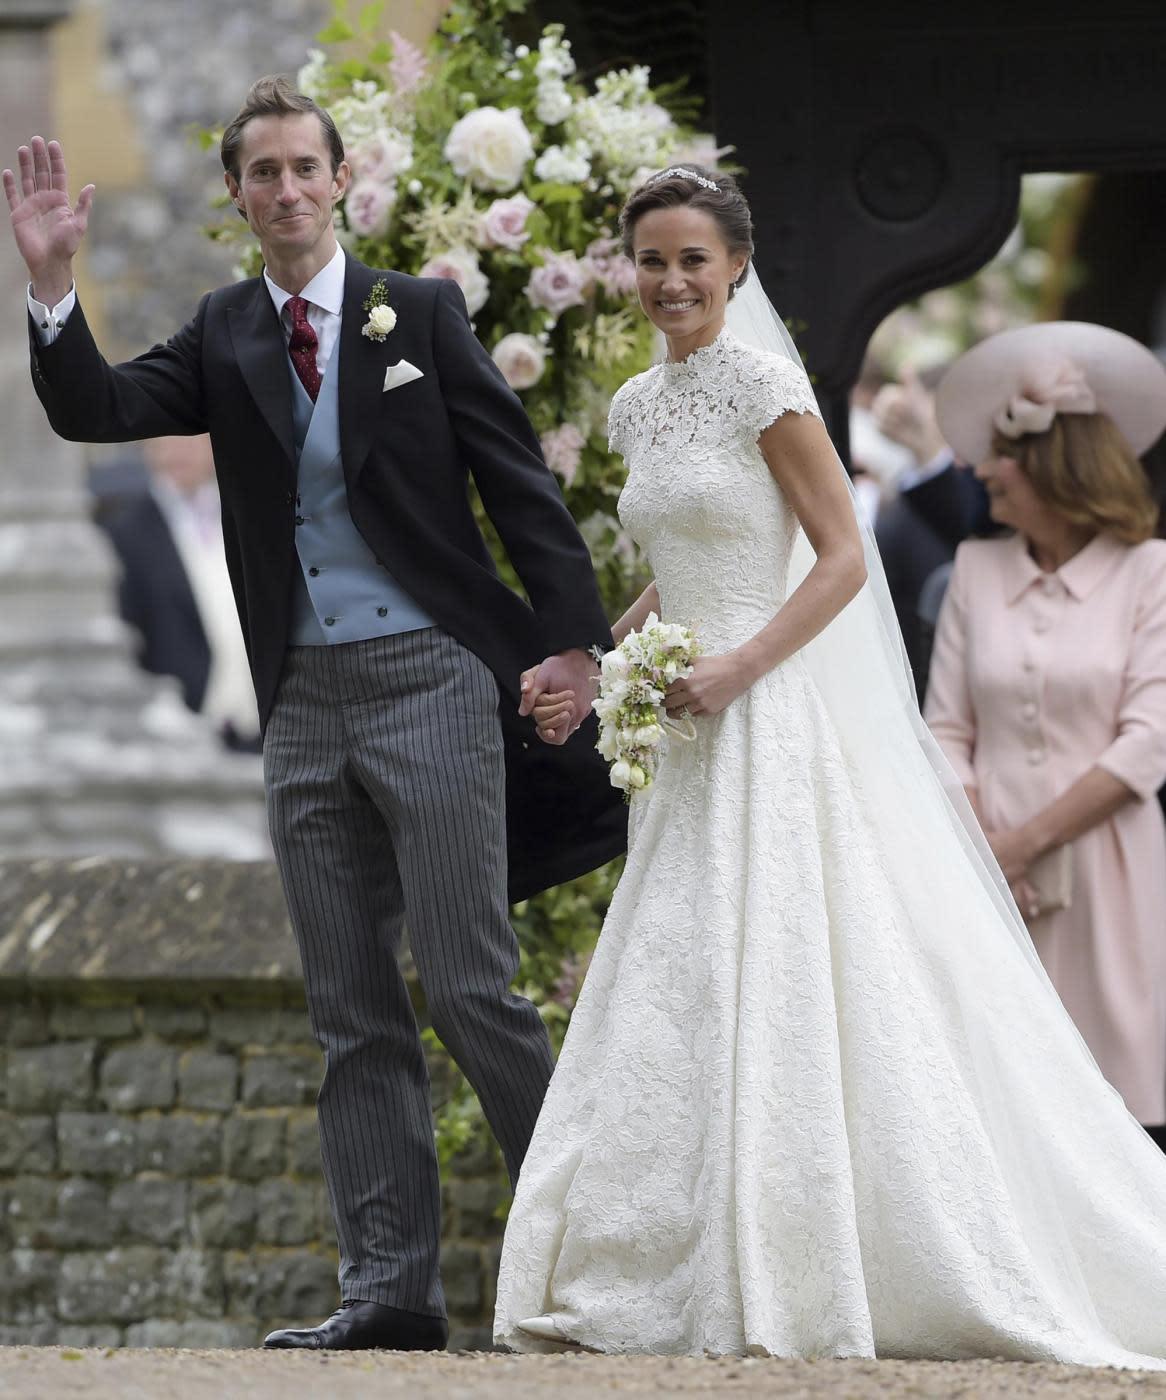 Matrimonio Pippa Middleton : Il matrimonio da sogno di pippa middleton